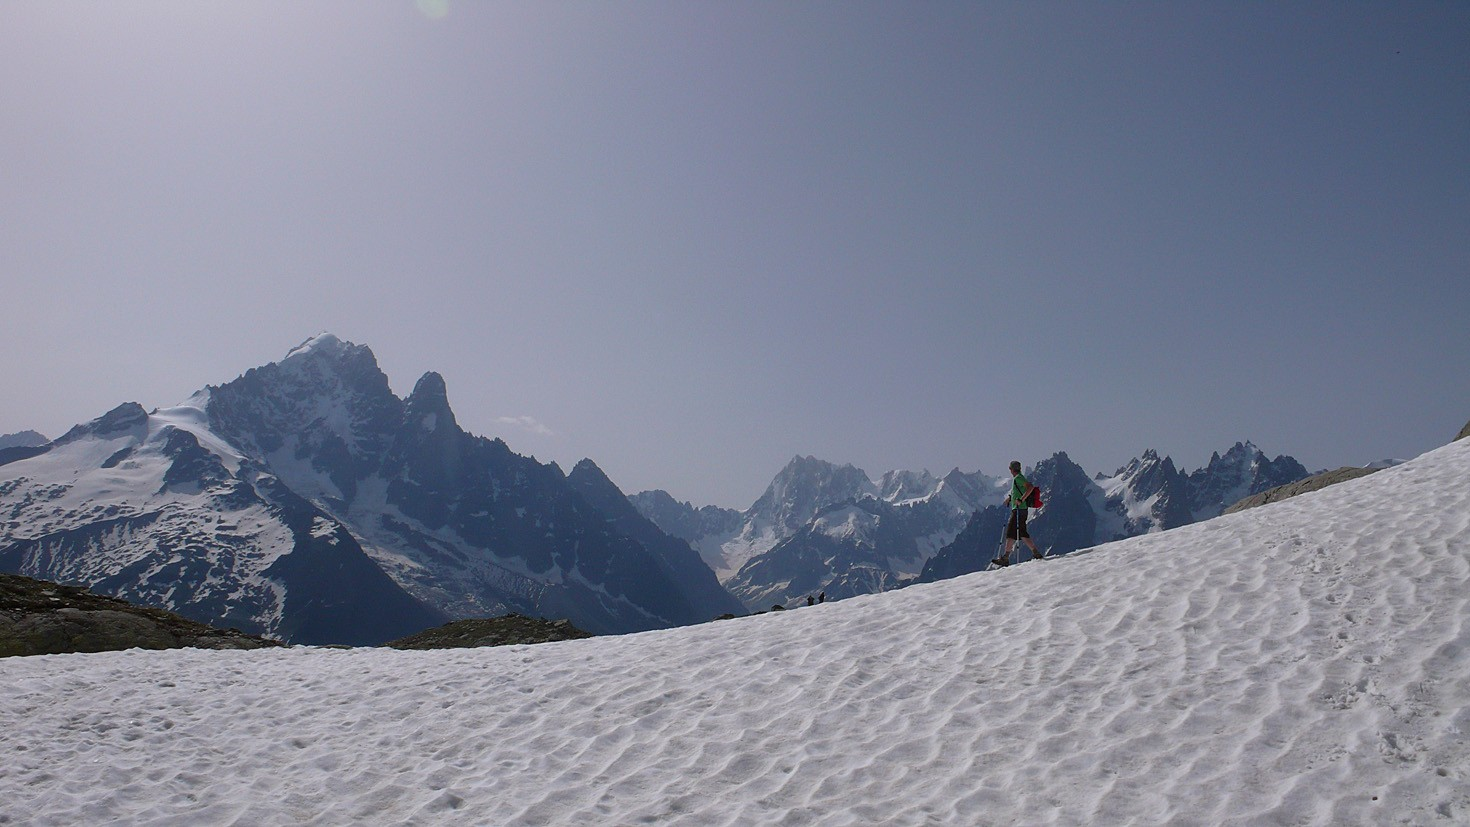 Neve near Lac Blanc